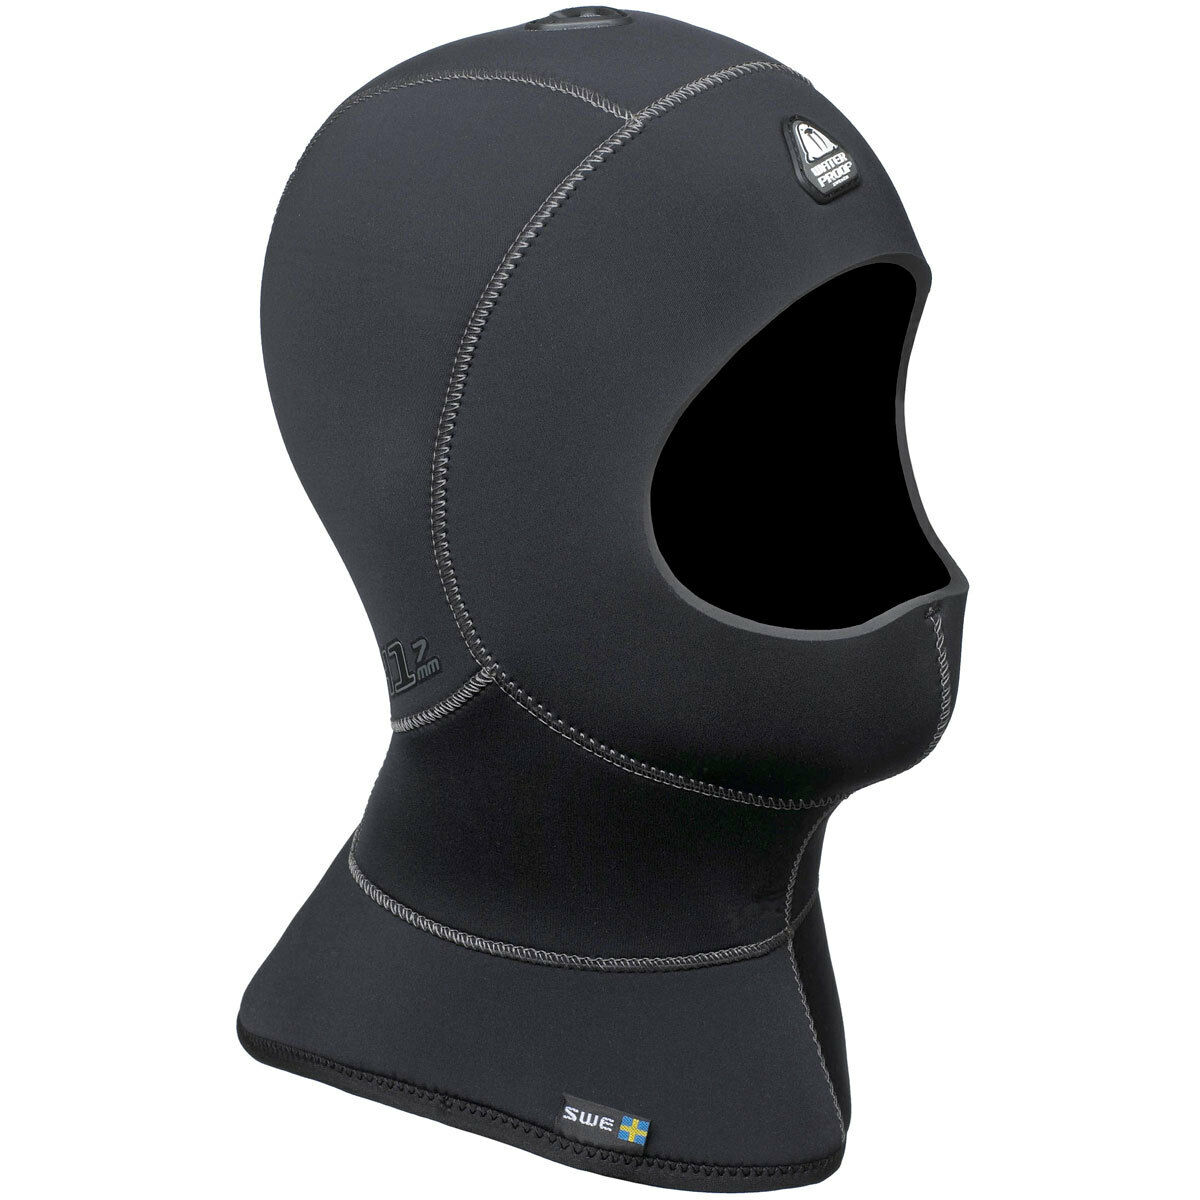 Waterproof H1 3 5 Hood W HAV  System Hood, size 2XL  more affordable